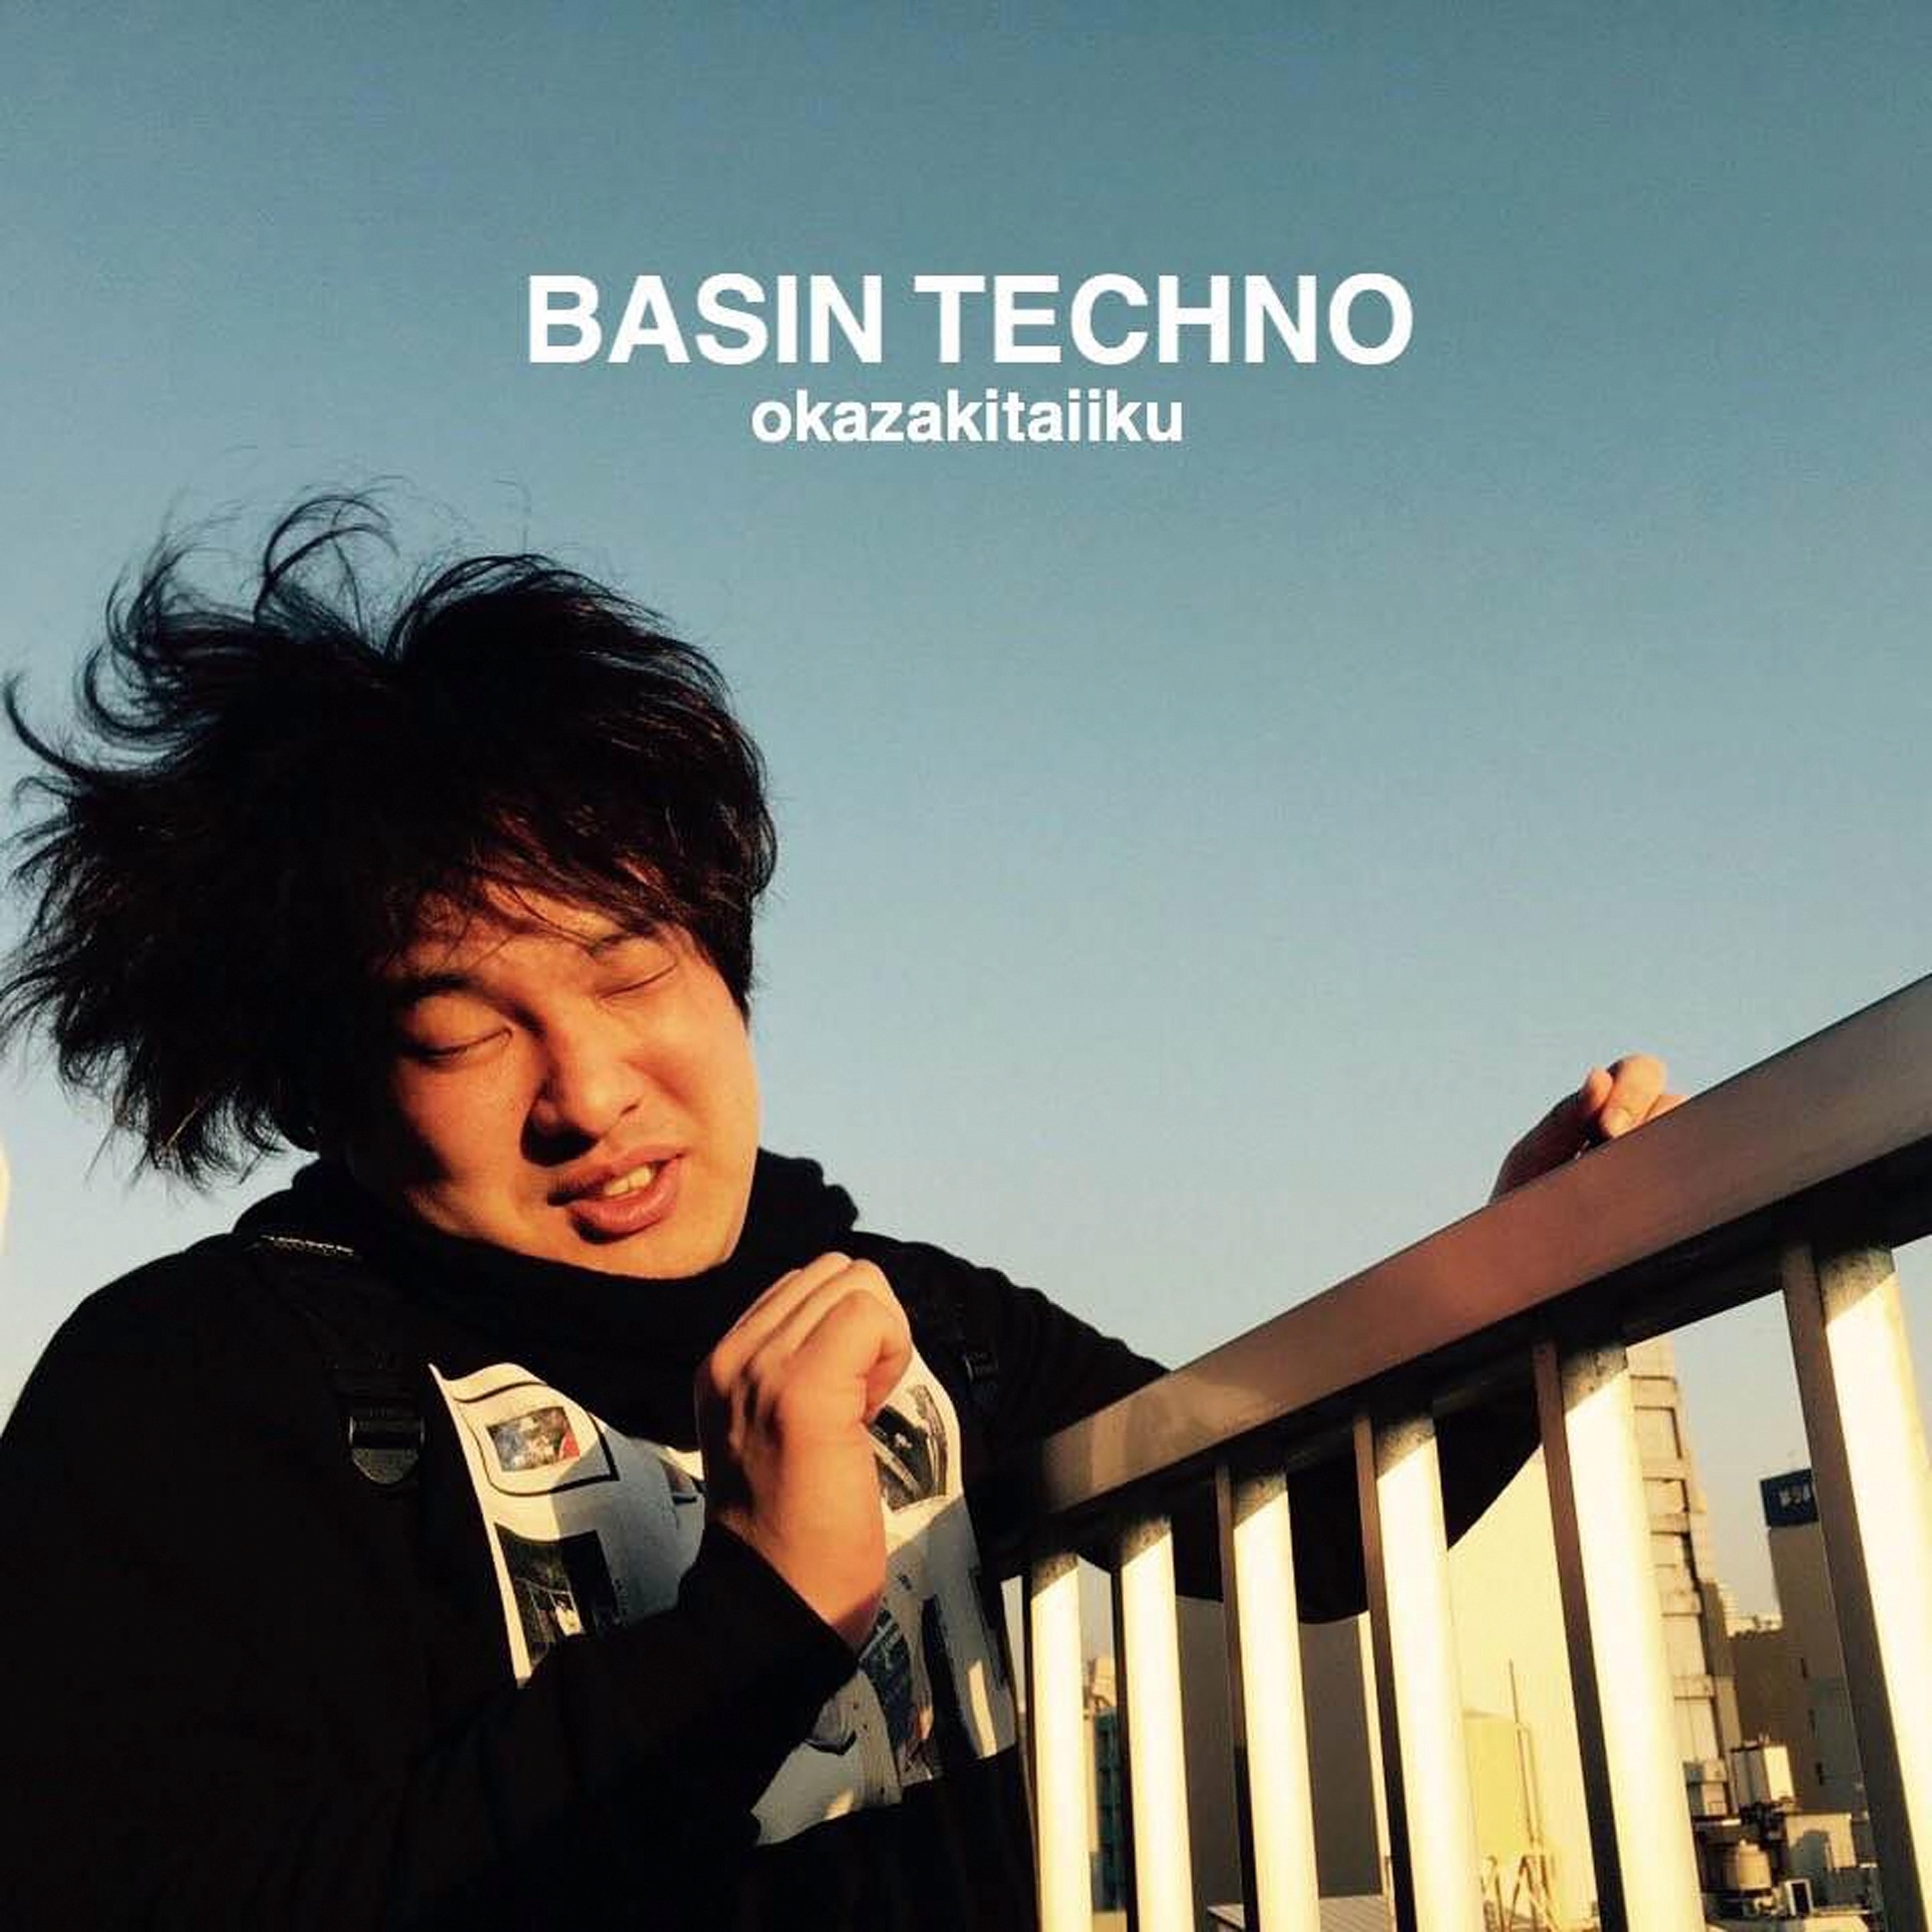 『BASIN TECHNO』通常盤ジャケット